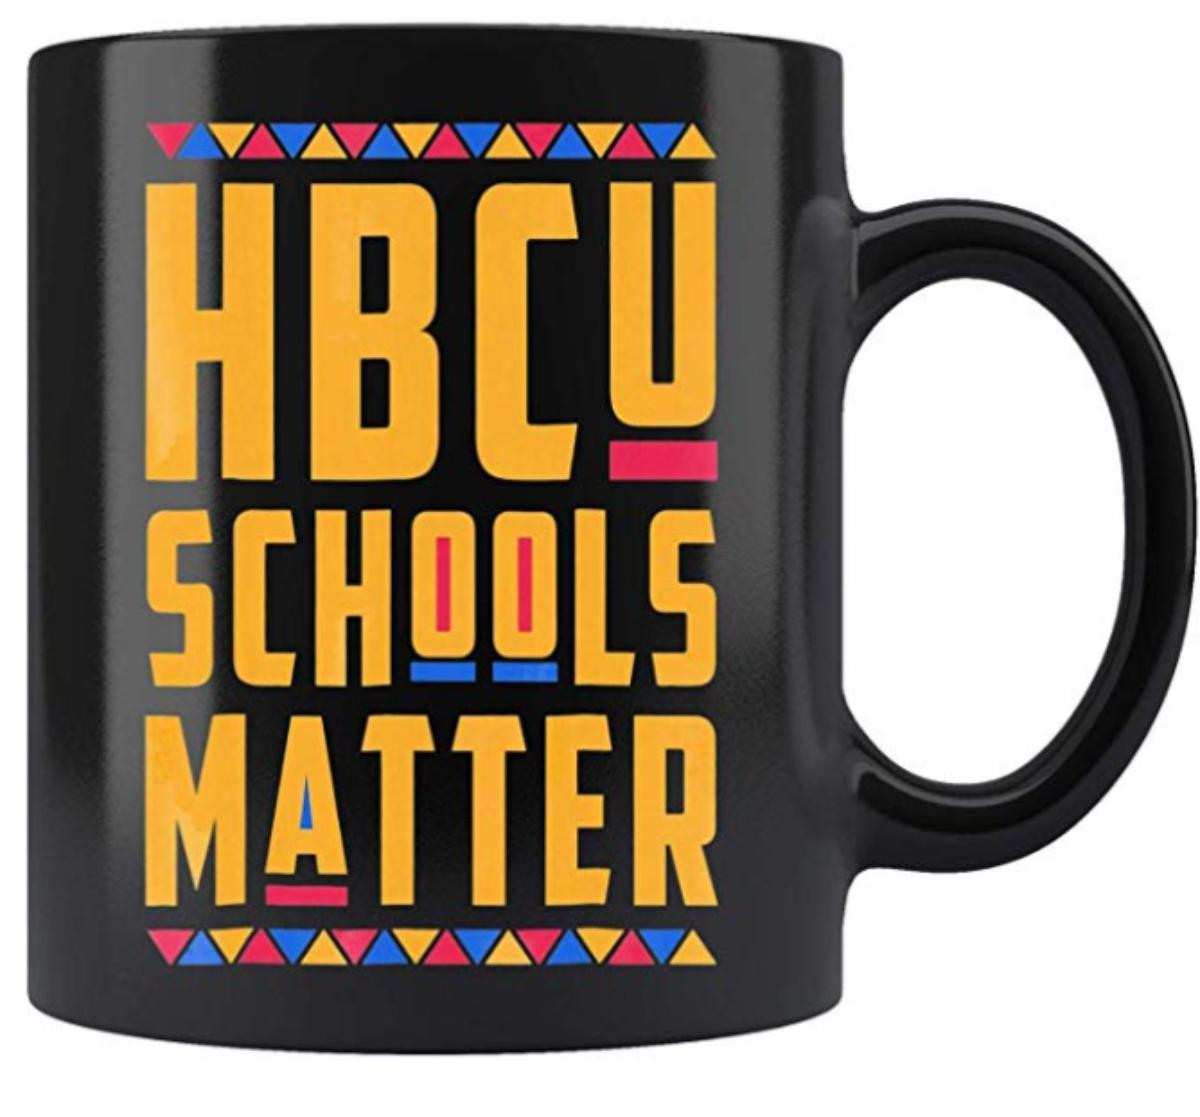 HBCU Schools Matter Mug